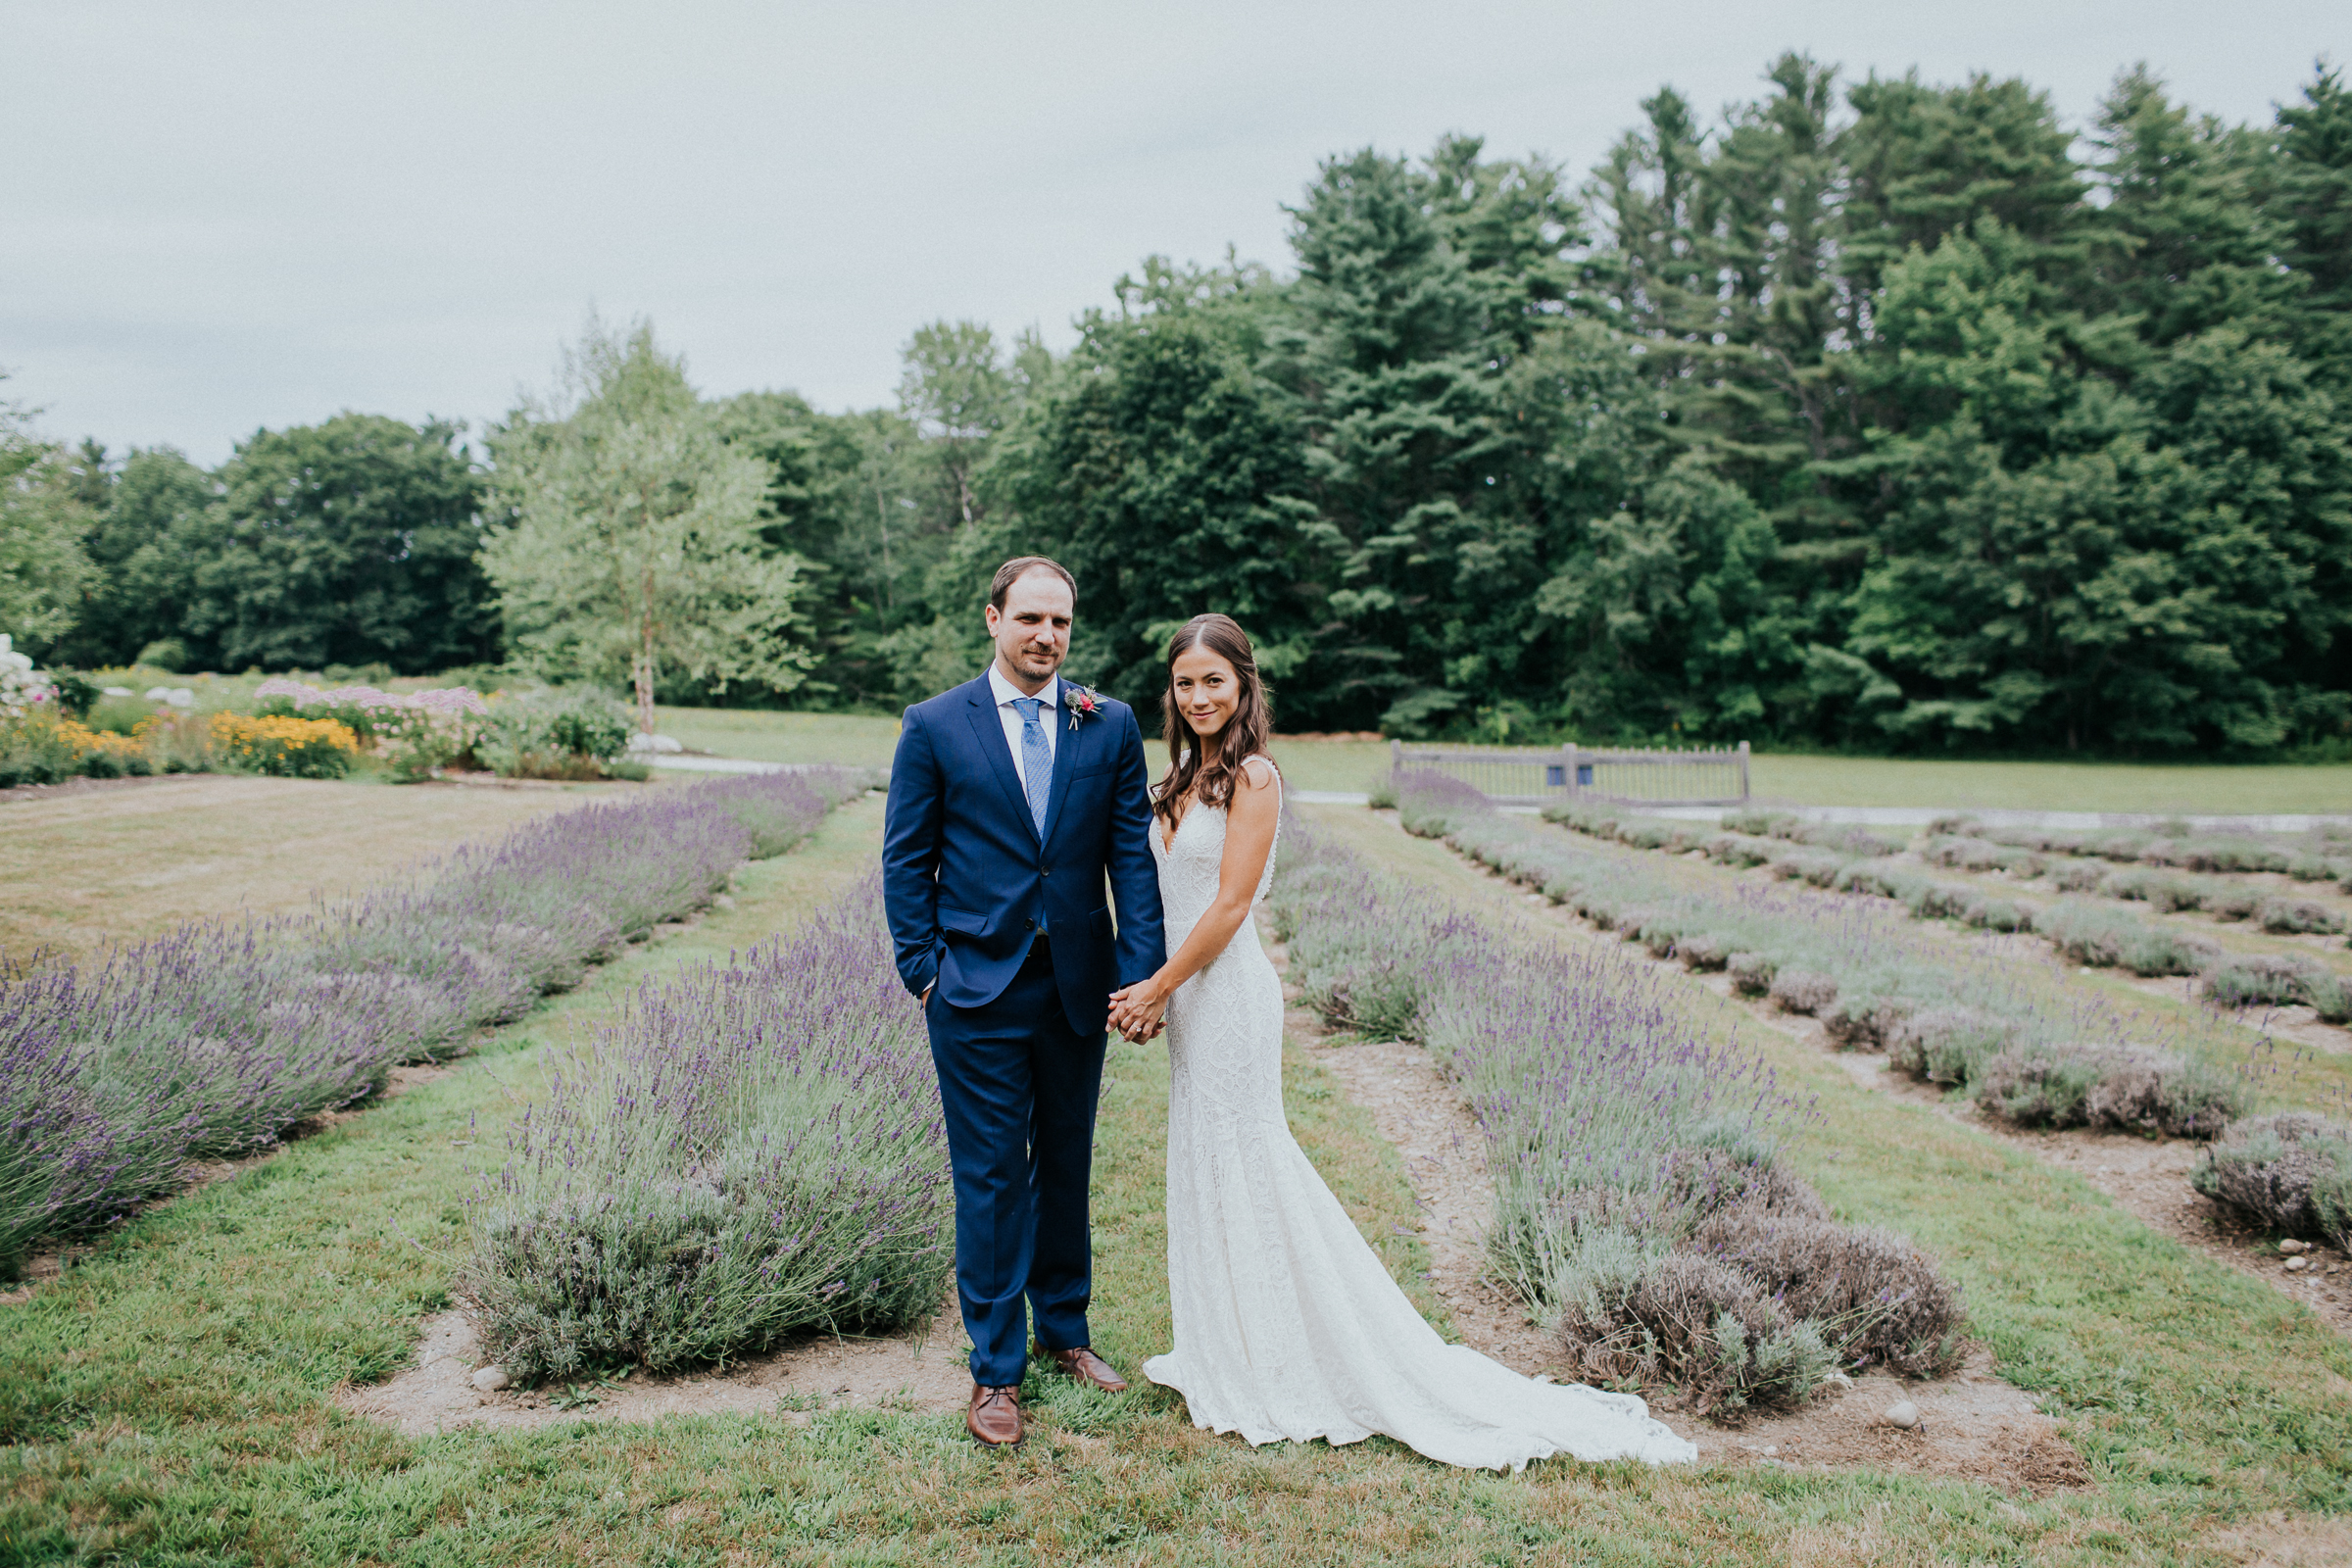 Marianmade-Farm-Wiscasset-Maine-Fine-Art-Documentary-Wedding-Photographer-Elvira-Kalviste-Photography-44.jpg